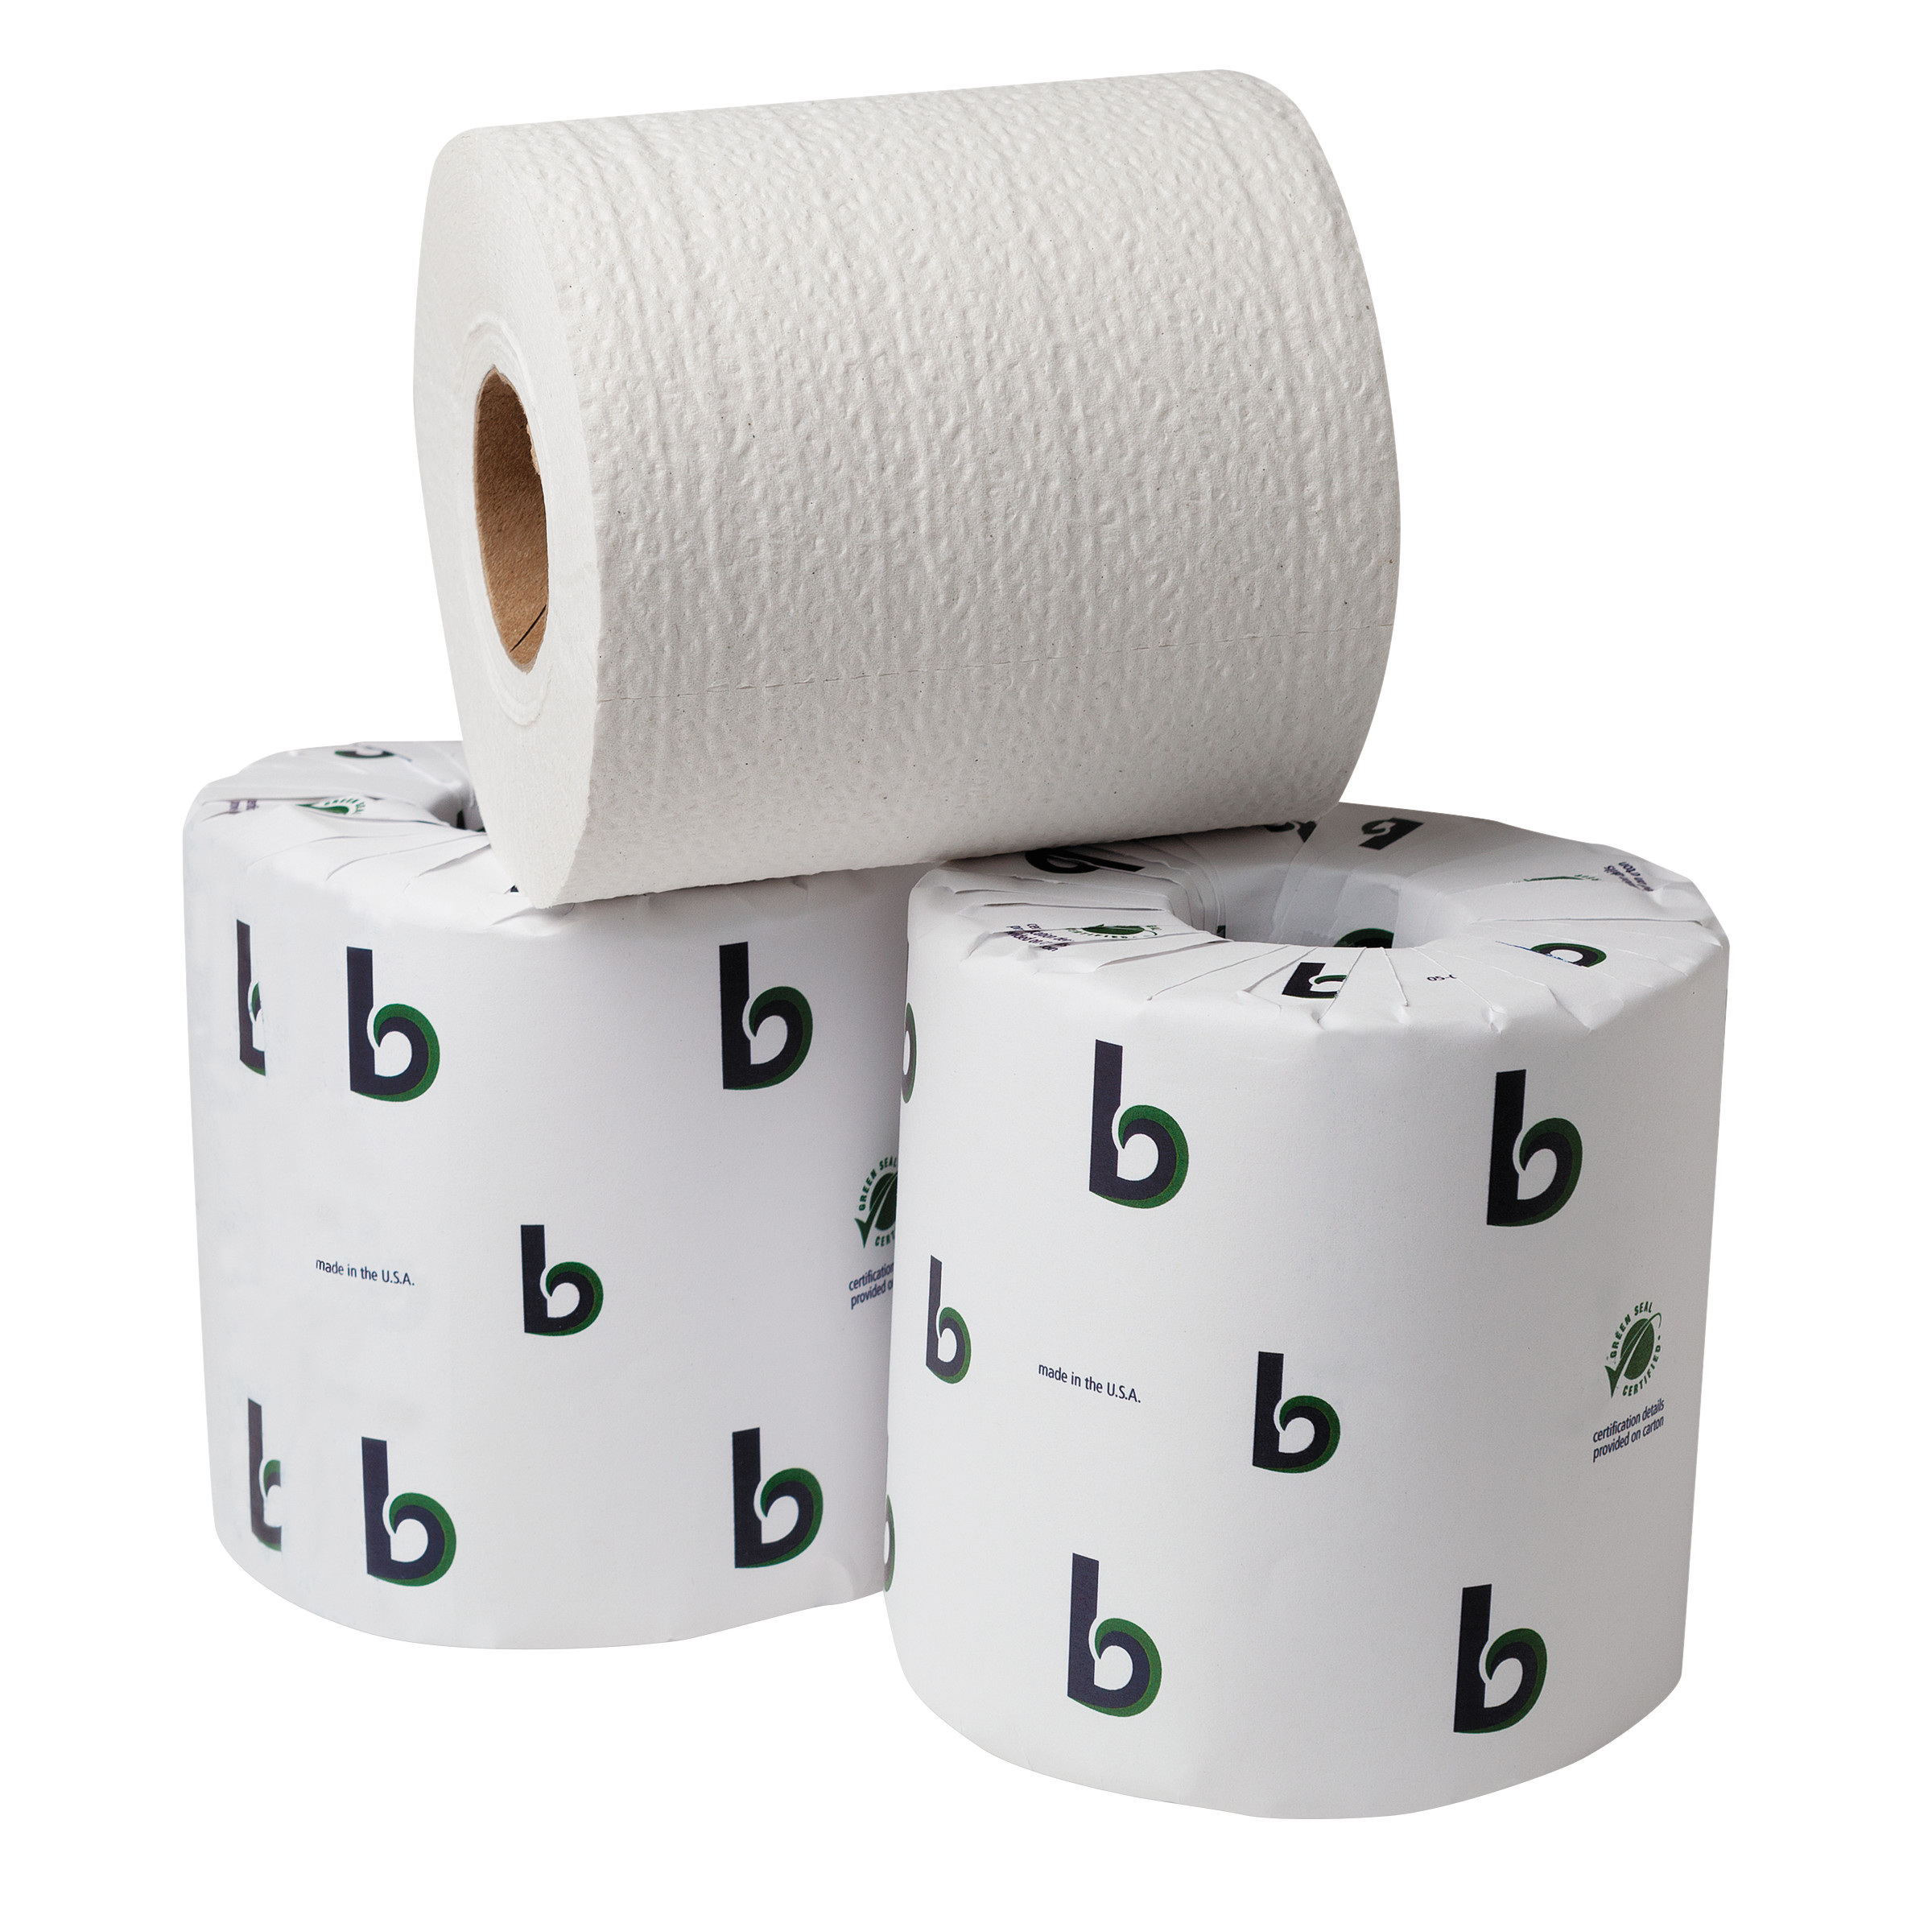 Boardwalk BWK20GREEN Boardwalk Green Bathroom Tissue, 2-Ply, White, 500 Sheets/Roll, 96 Rolls/Carton